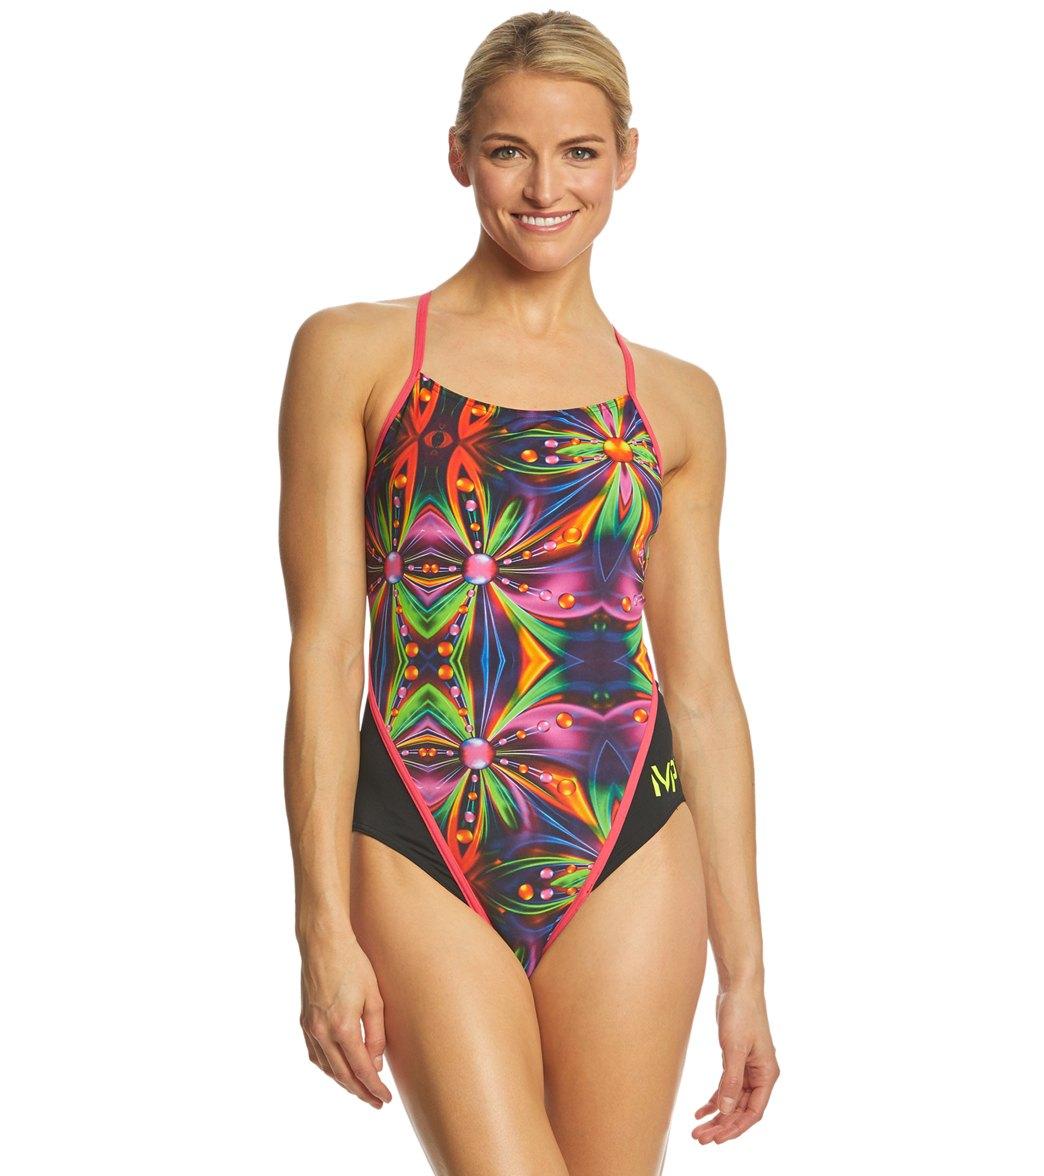 3a577c5ecc MP Michael Phelps Women's Zita Racerback One Piece Swimsuit at  SwimOutlet.com - Free Shipping